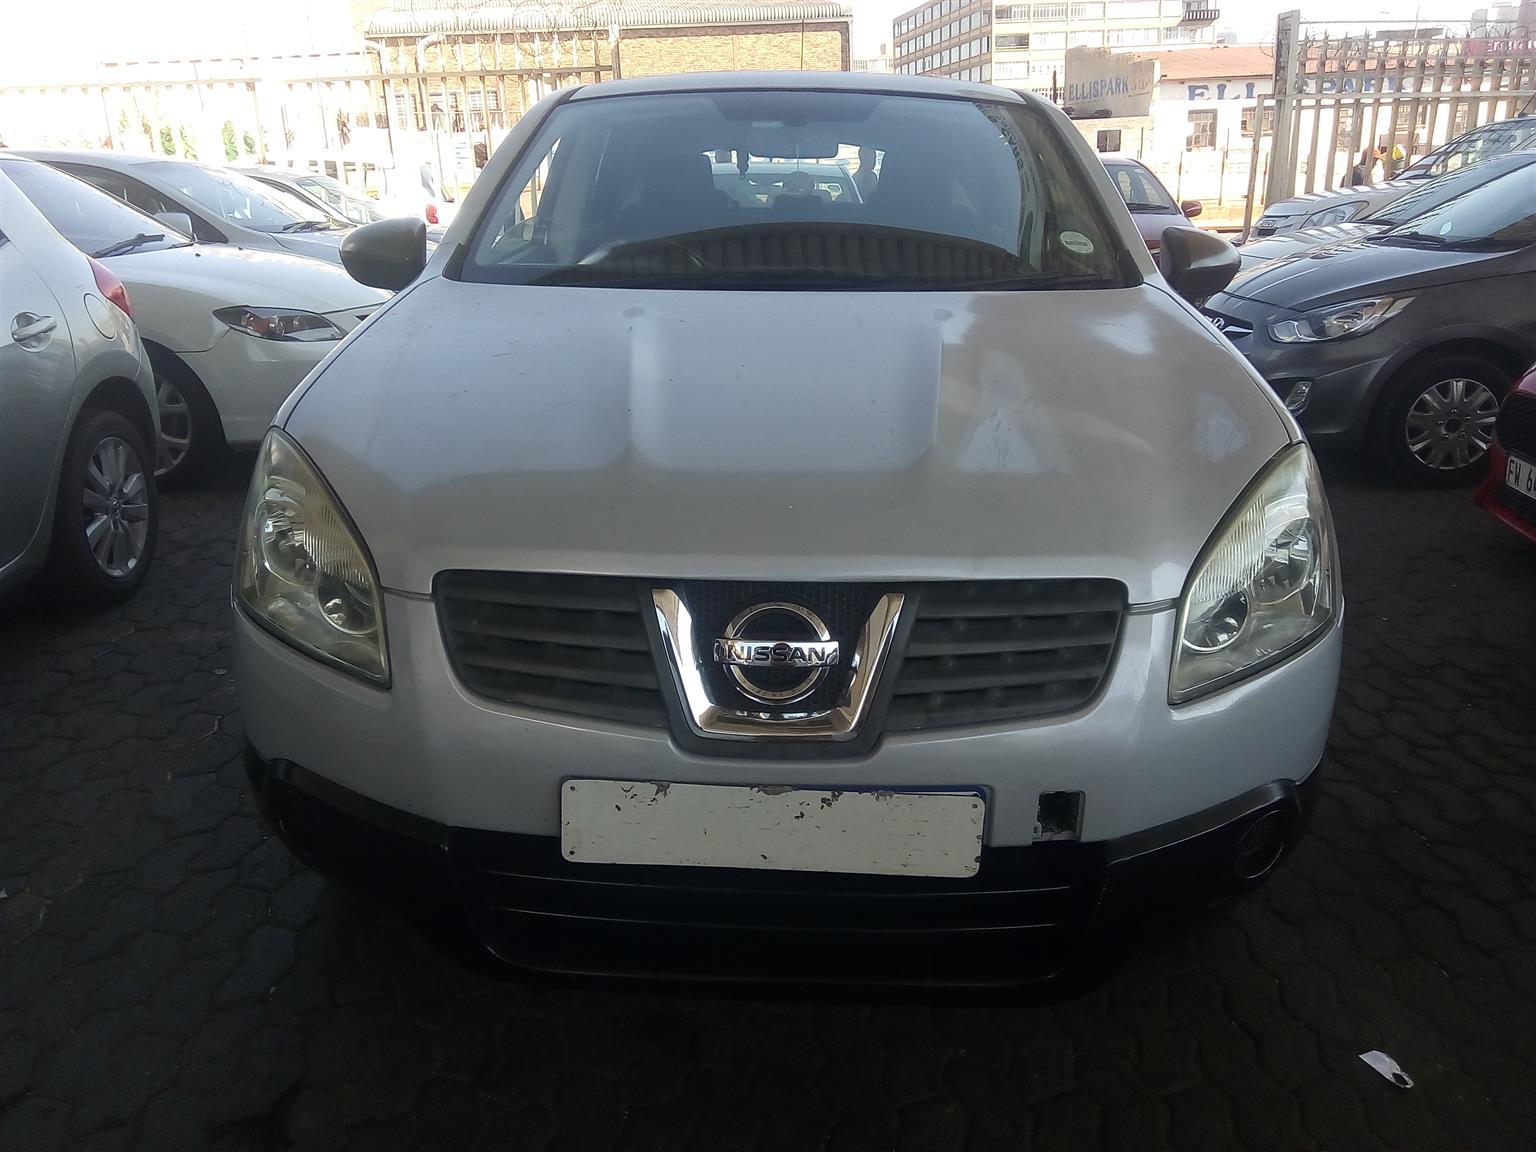 2008 Nissan Qashqai QASHQAI 1.5 dCi ACENTA